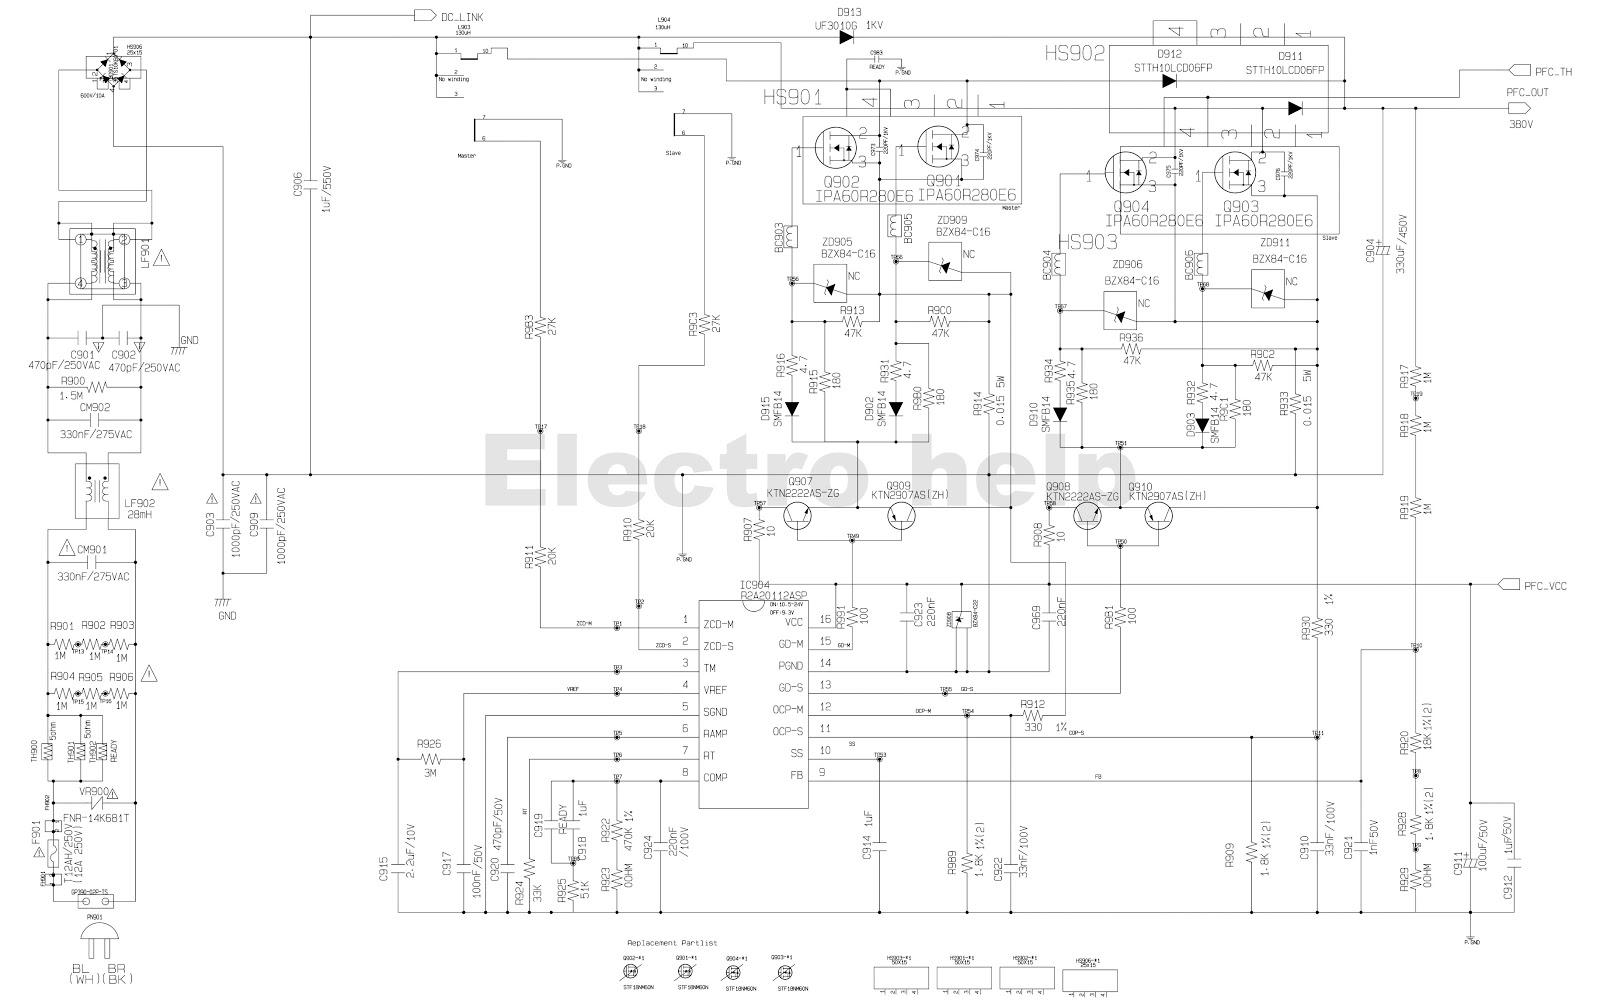 LG CM8430 - Mini HiFi Shelf system